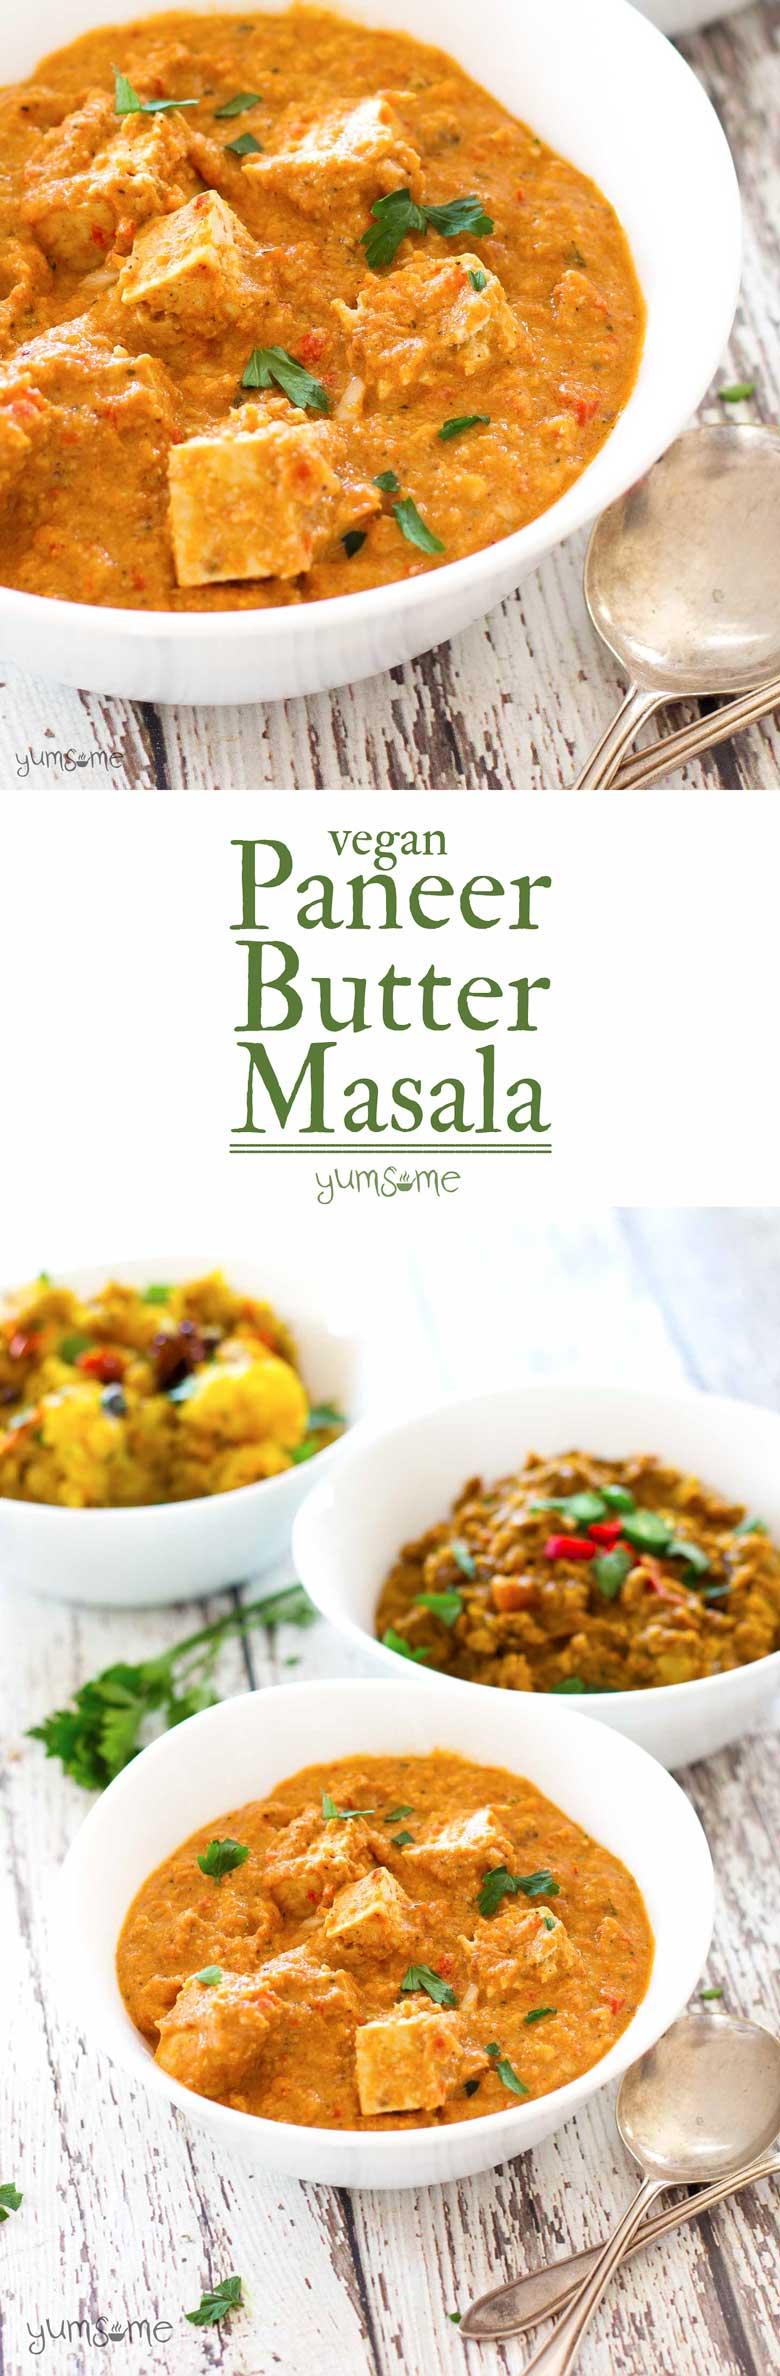 Vegan Paneer Butter Masala